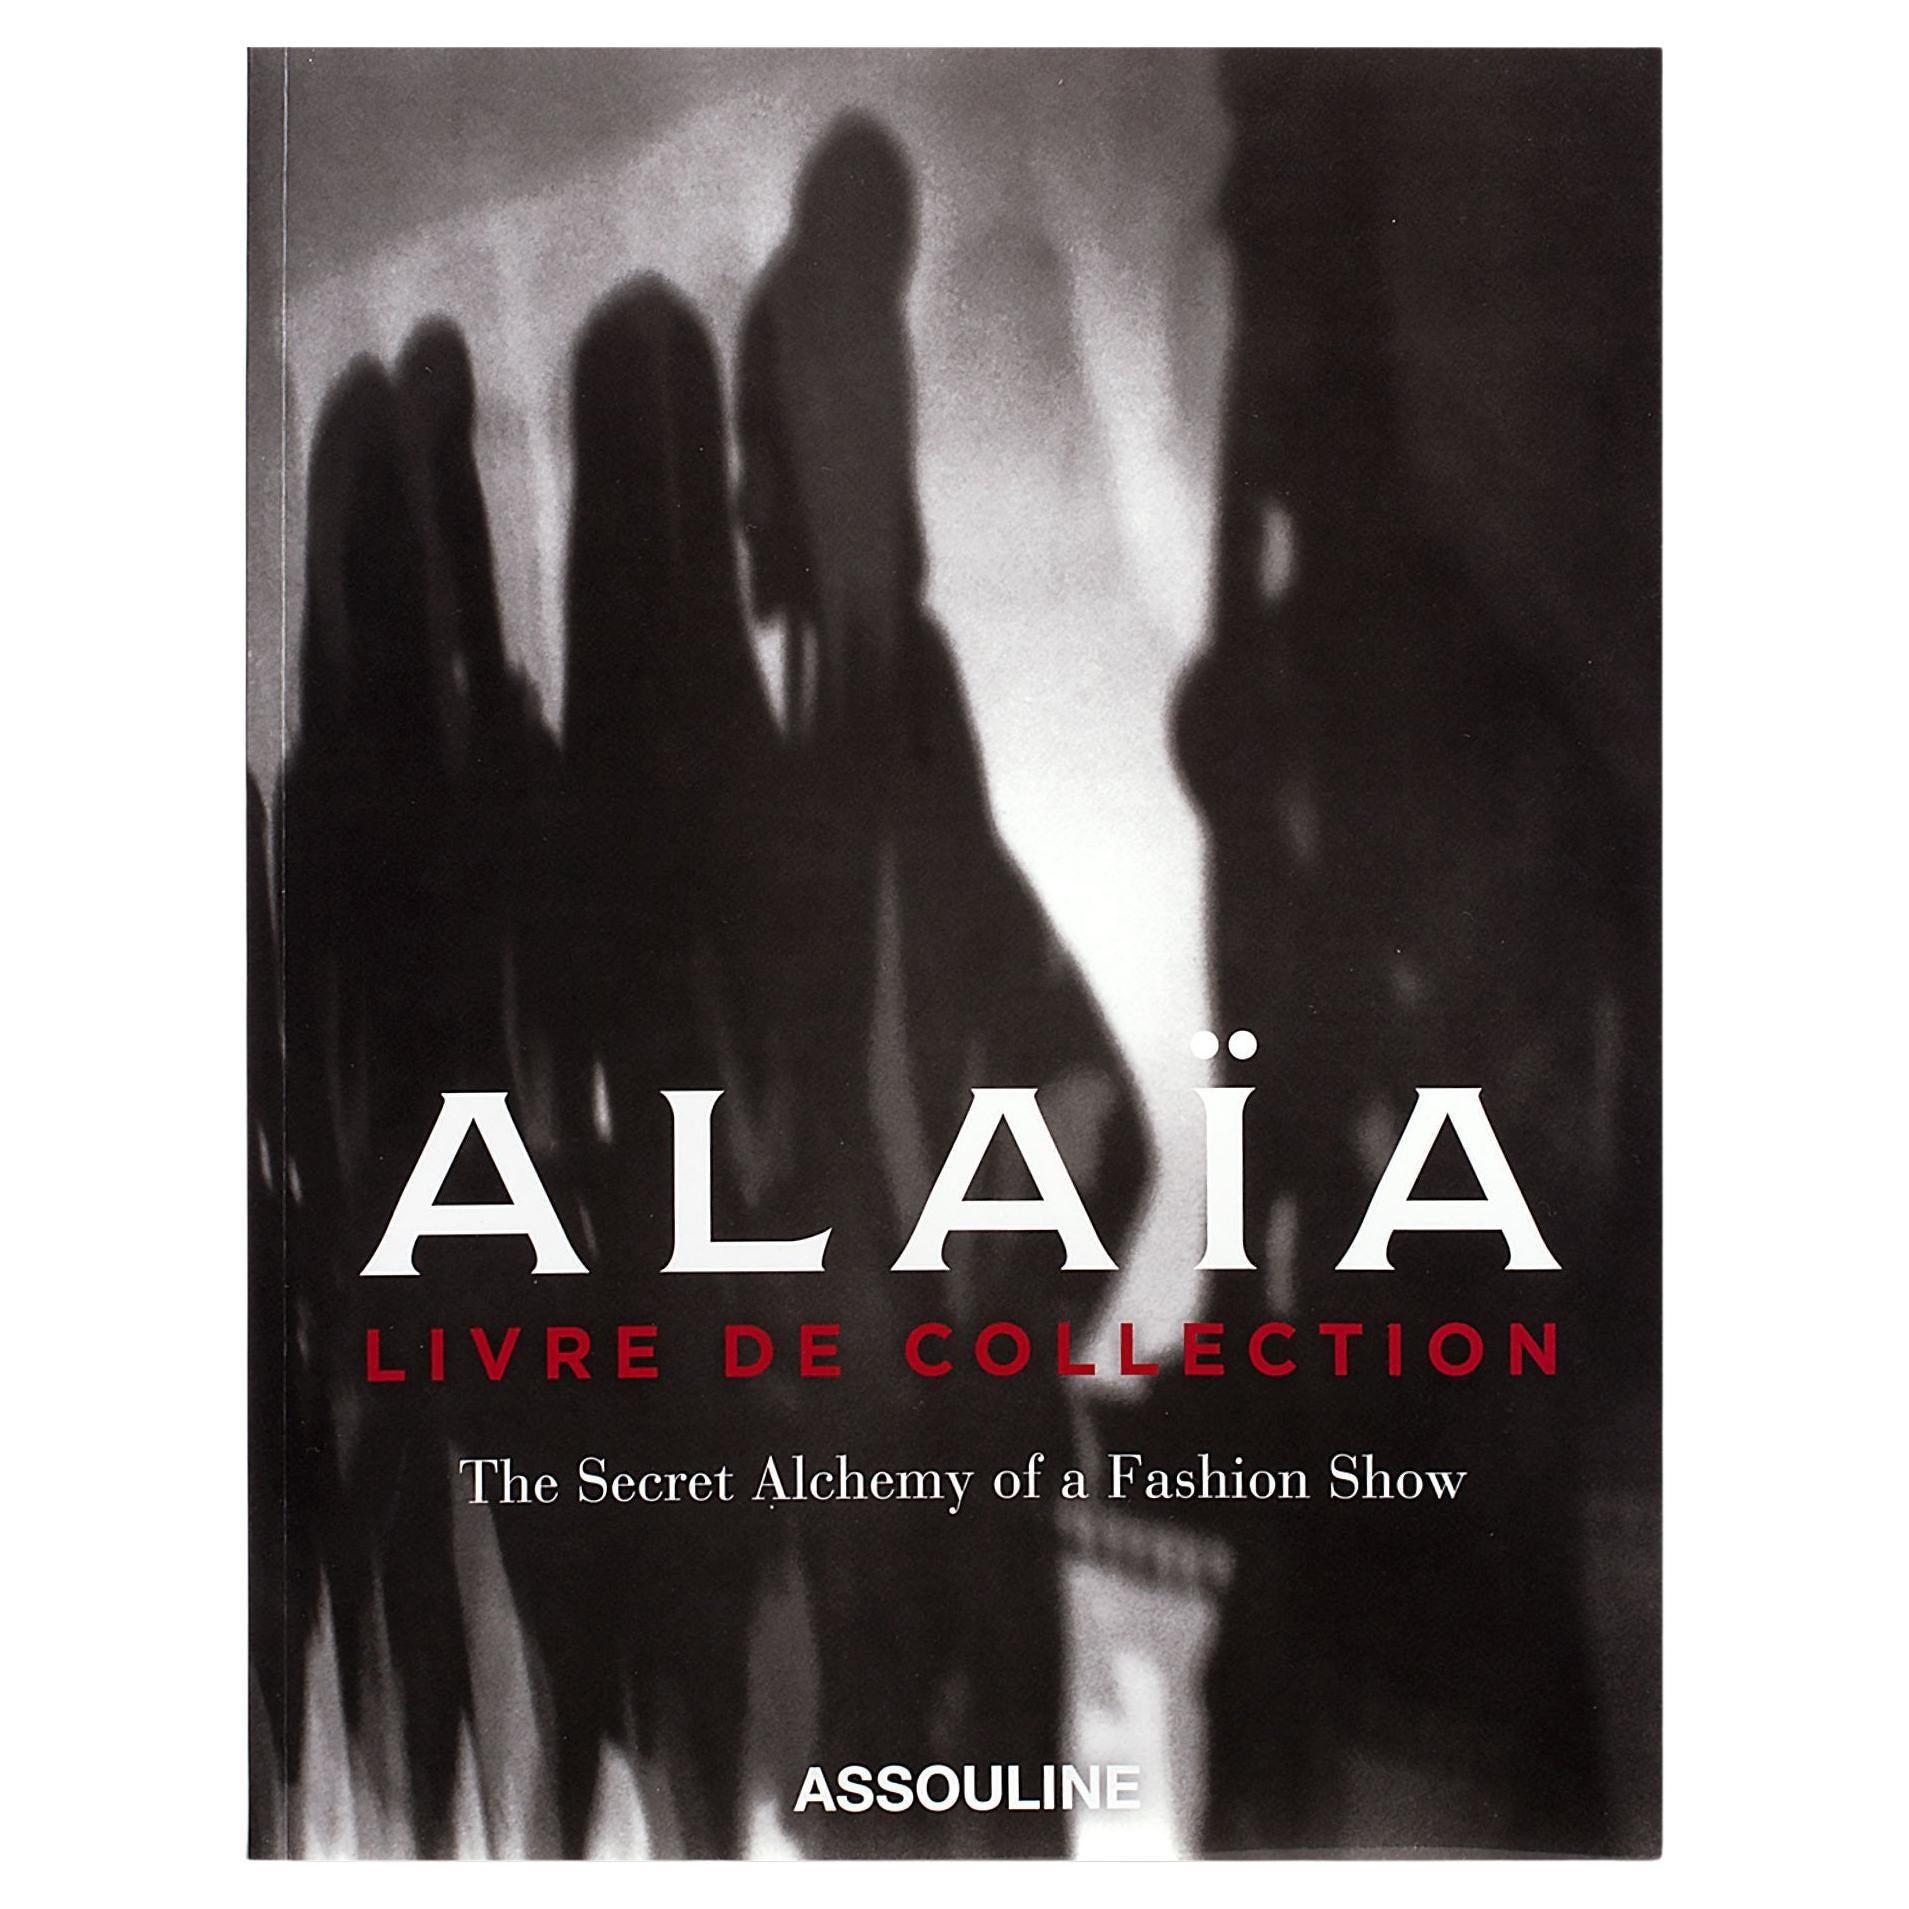 in Stock in Los Angeles, Alaïa Livre de Collection by Prosper Assouline